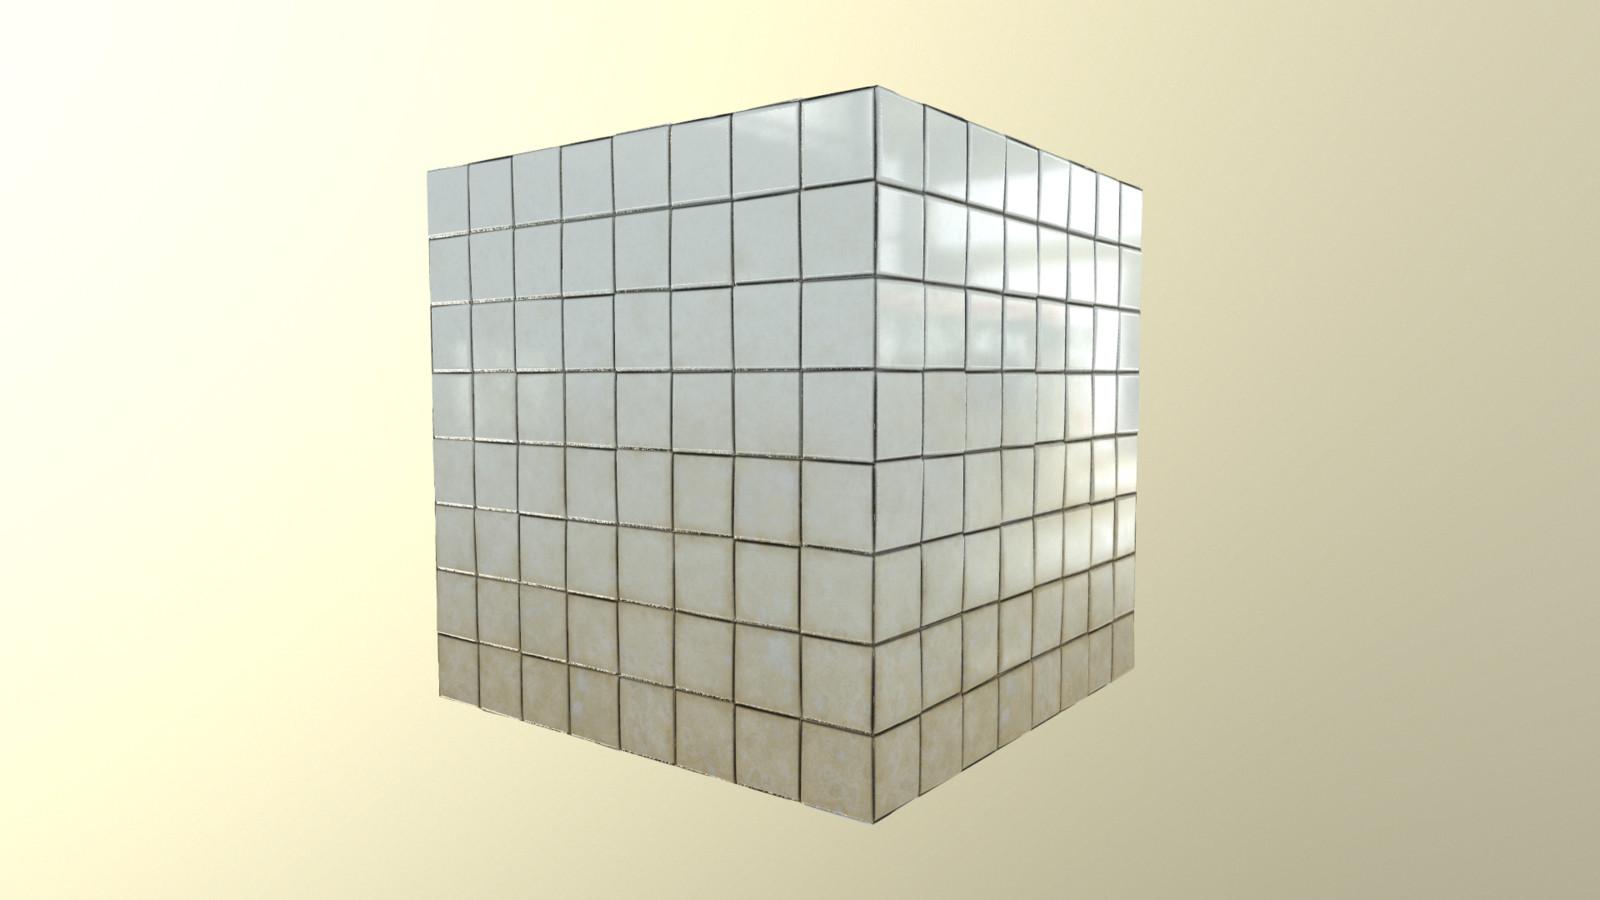 Porcelain tiles material